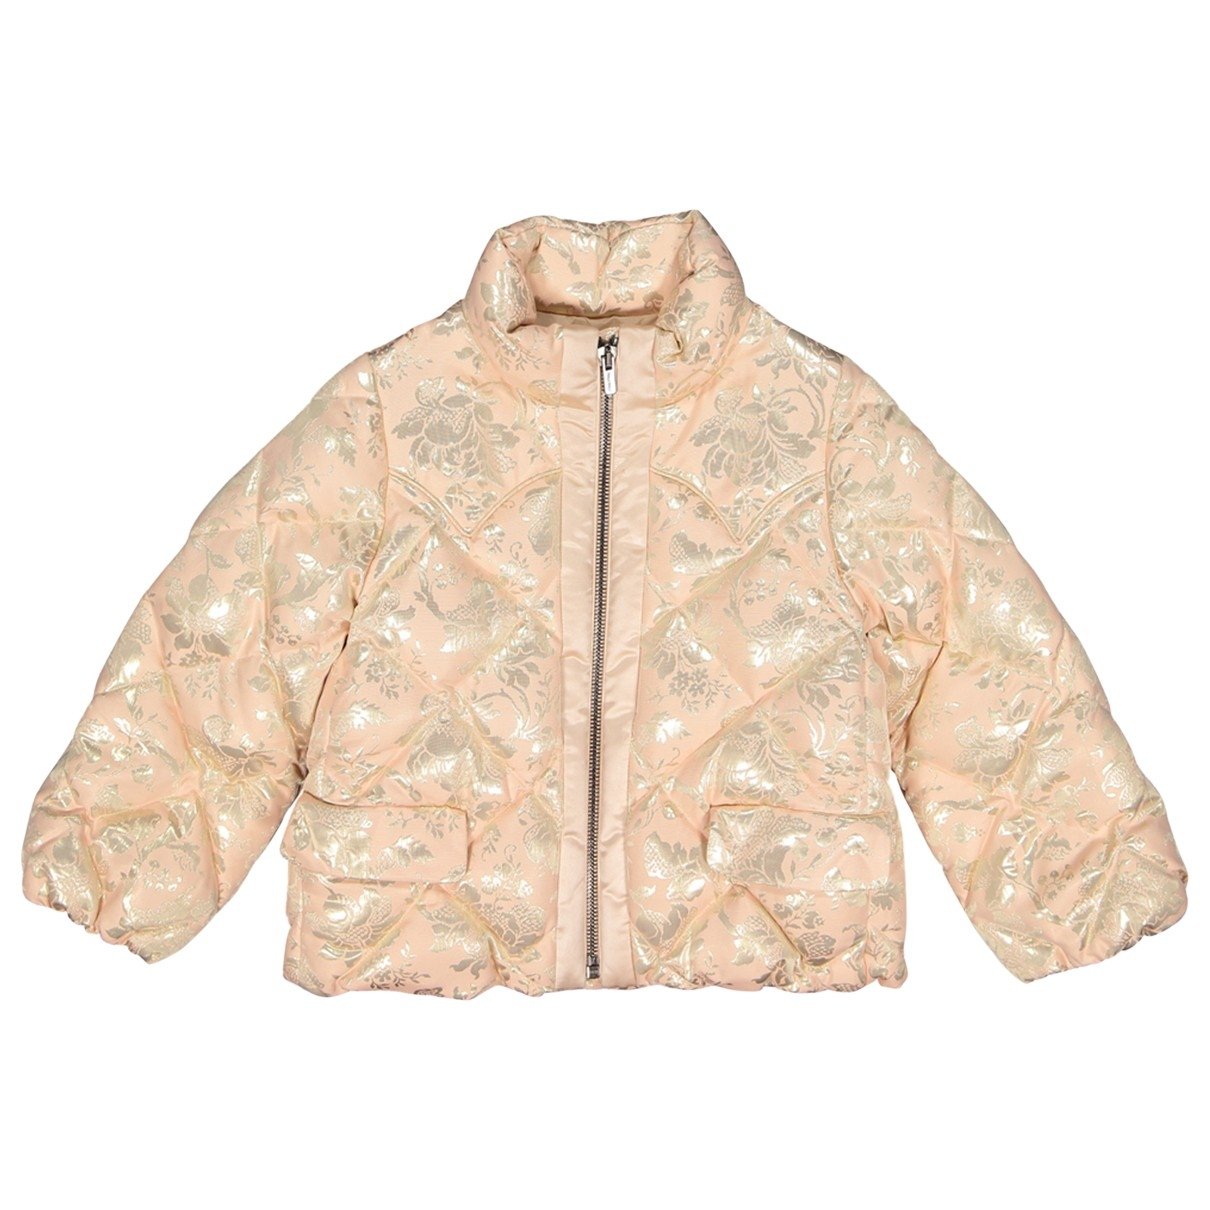 Miu Miu - Manteau   pour femme - rose